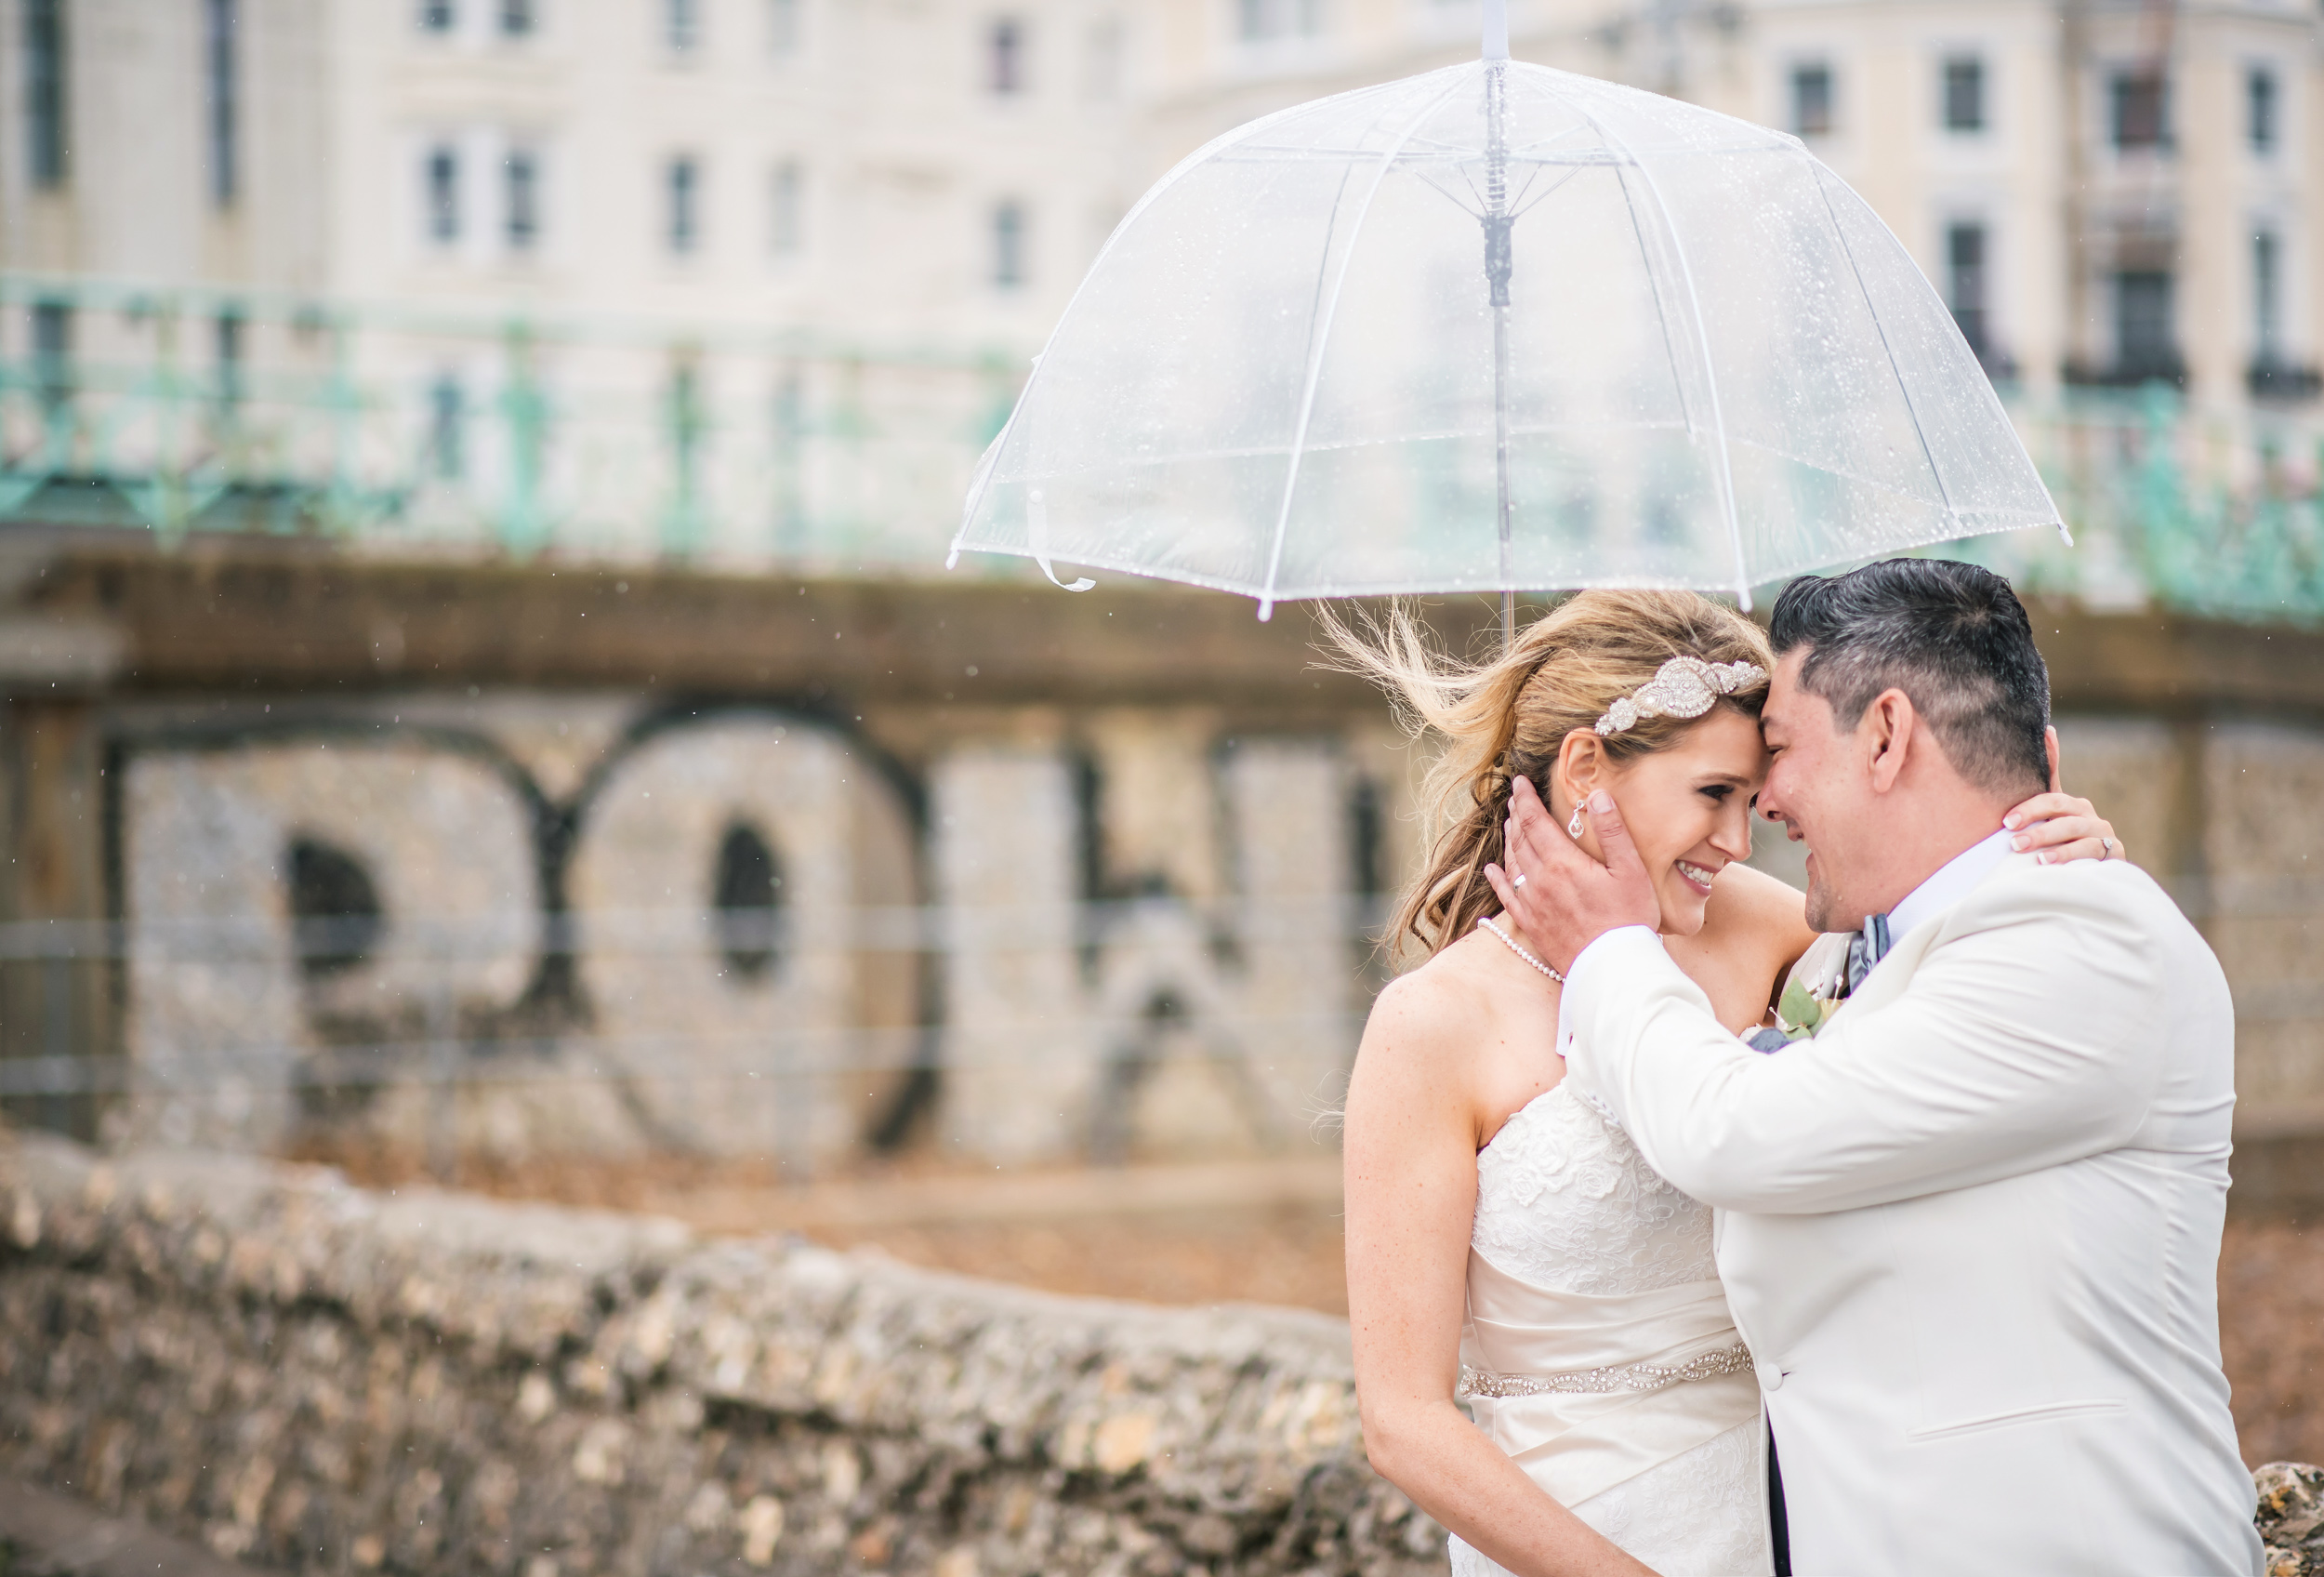 David Scholes Lancashire wedding photography 2016-104.jpg